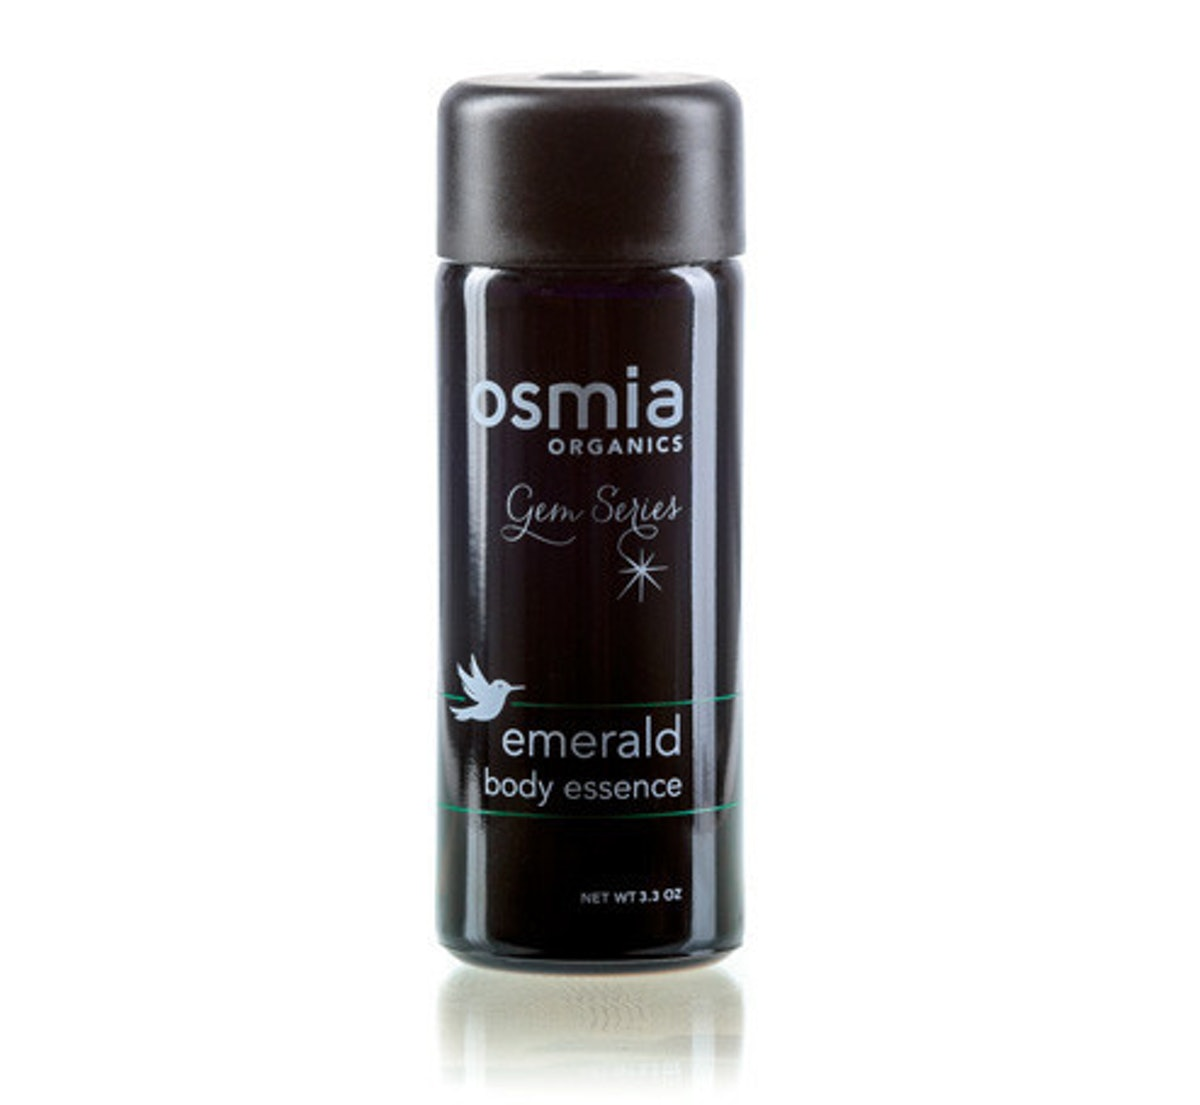 Osmia Emerald Body Essence